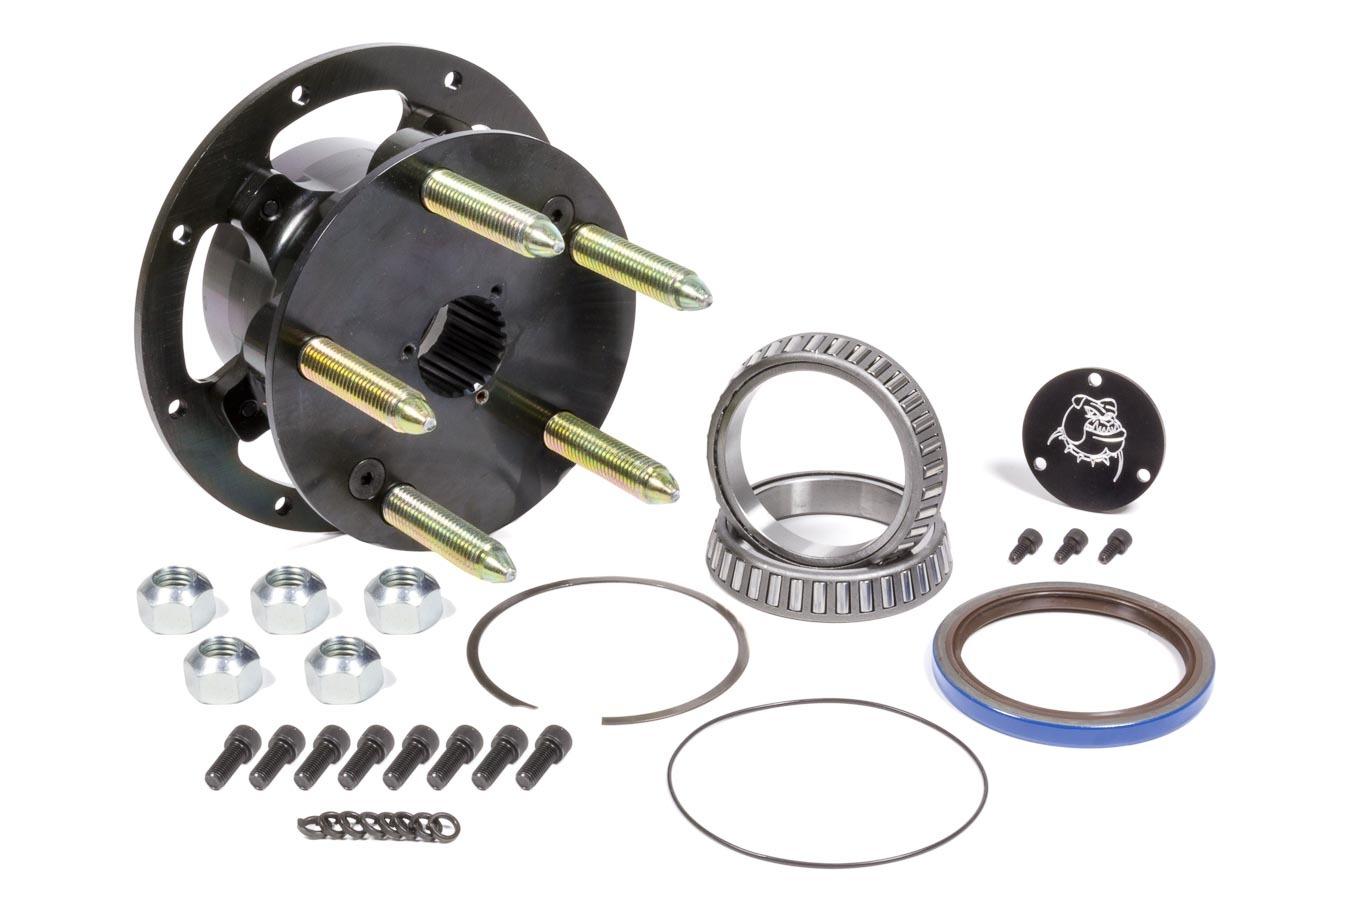 Diversified Machine CRC-2050 Wheel Hub, Rear, 5 x 5.00 Wheel, Bearings / Dust Cap / Hardware / Wheel Studs Included, Seals, Steel, Black, 2-7/8 in Smart Tube, Kit